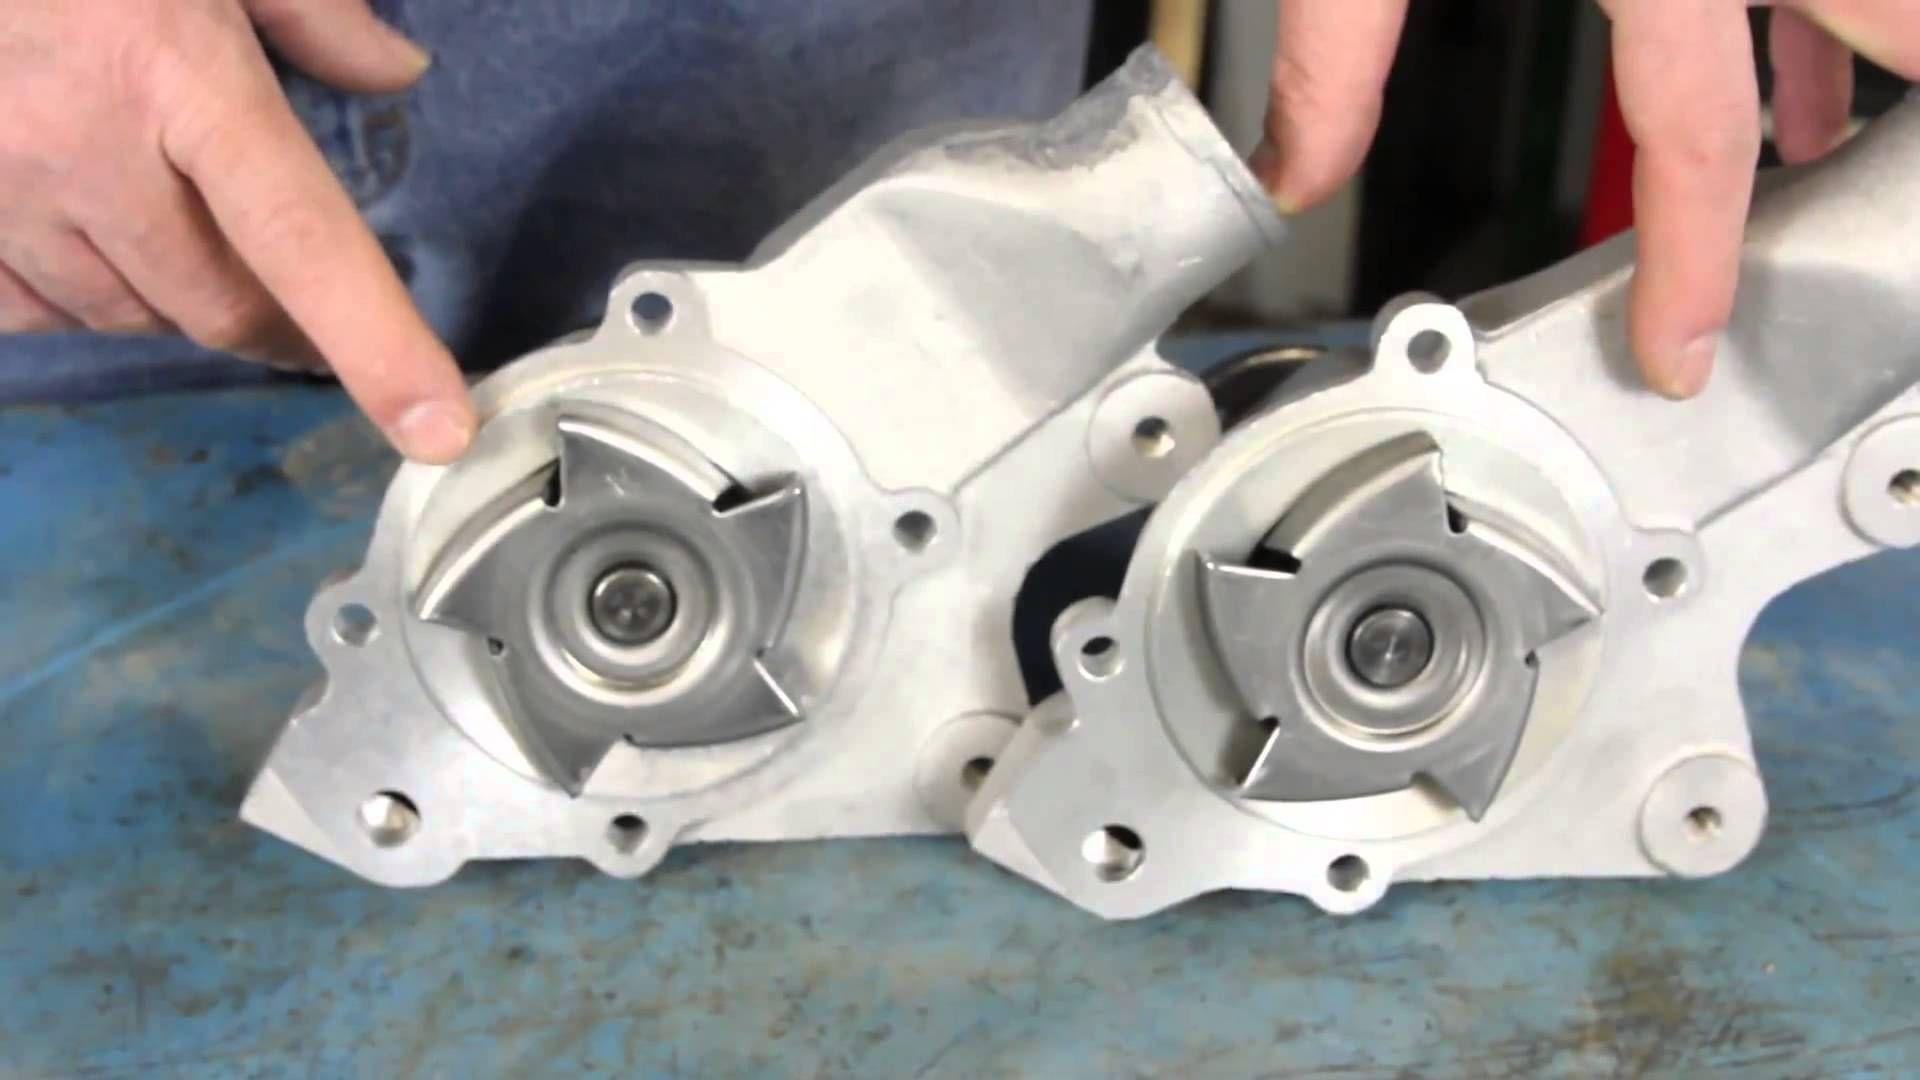 Standard Vs Reverse Rotation Water Pumps Advance Auto Diy Repair Water Pumps Car Maintenance